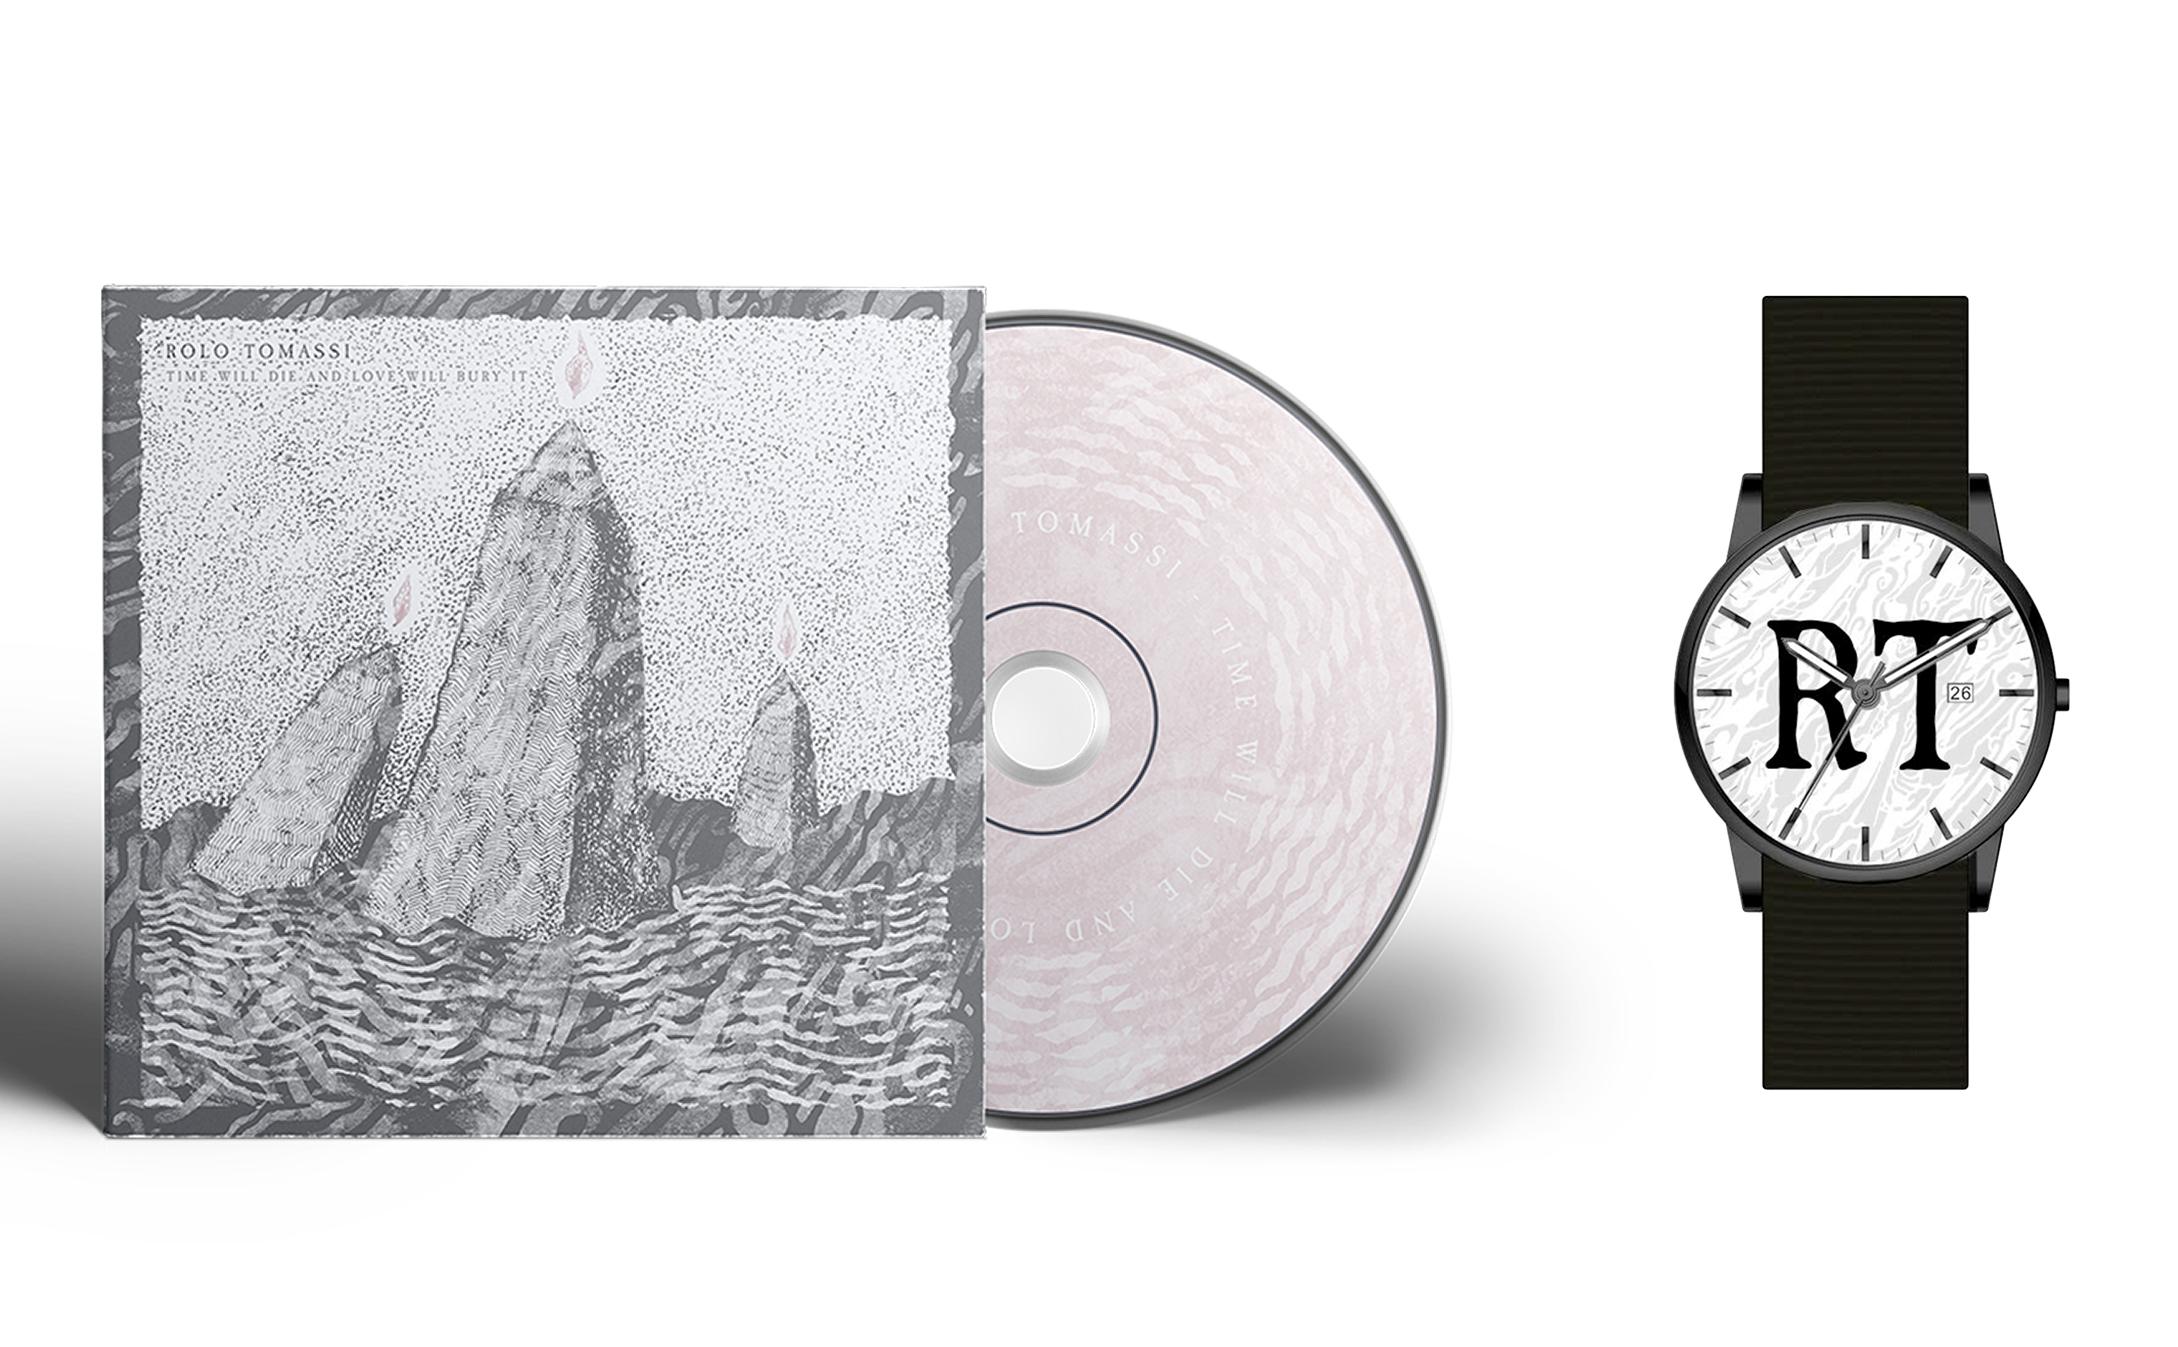 Rolo Tomassi - '...Love Will Bury It' CD + watch